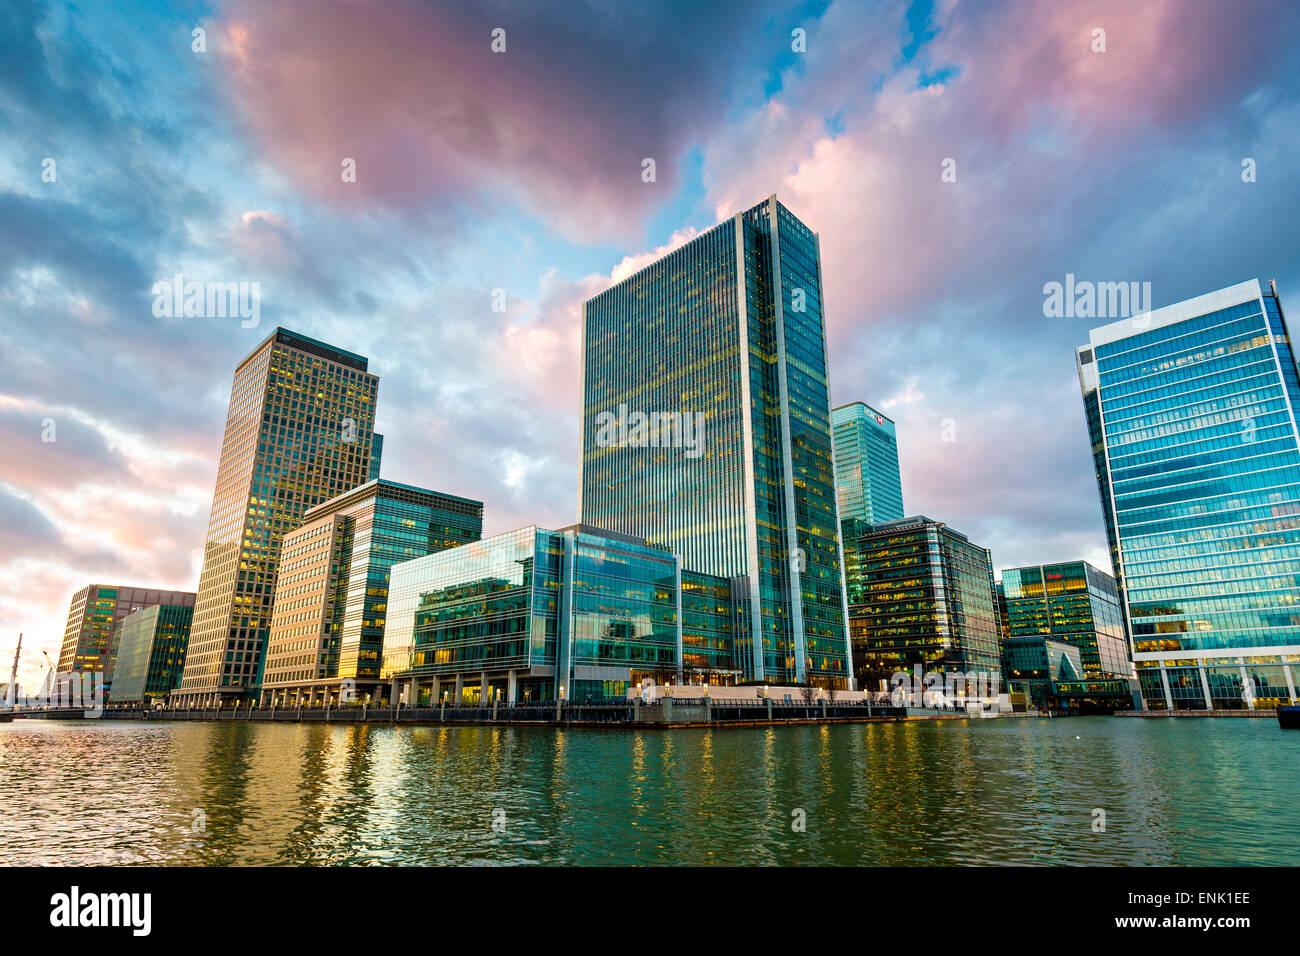 Canary Wharf at dusk, Docklands, London, England, United Kingdom, Europe - Stock Image